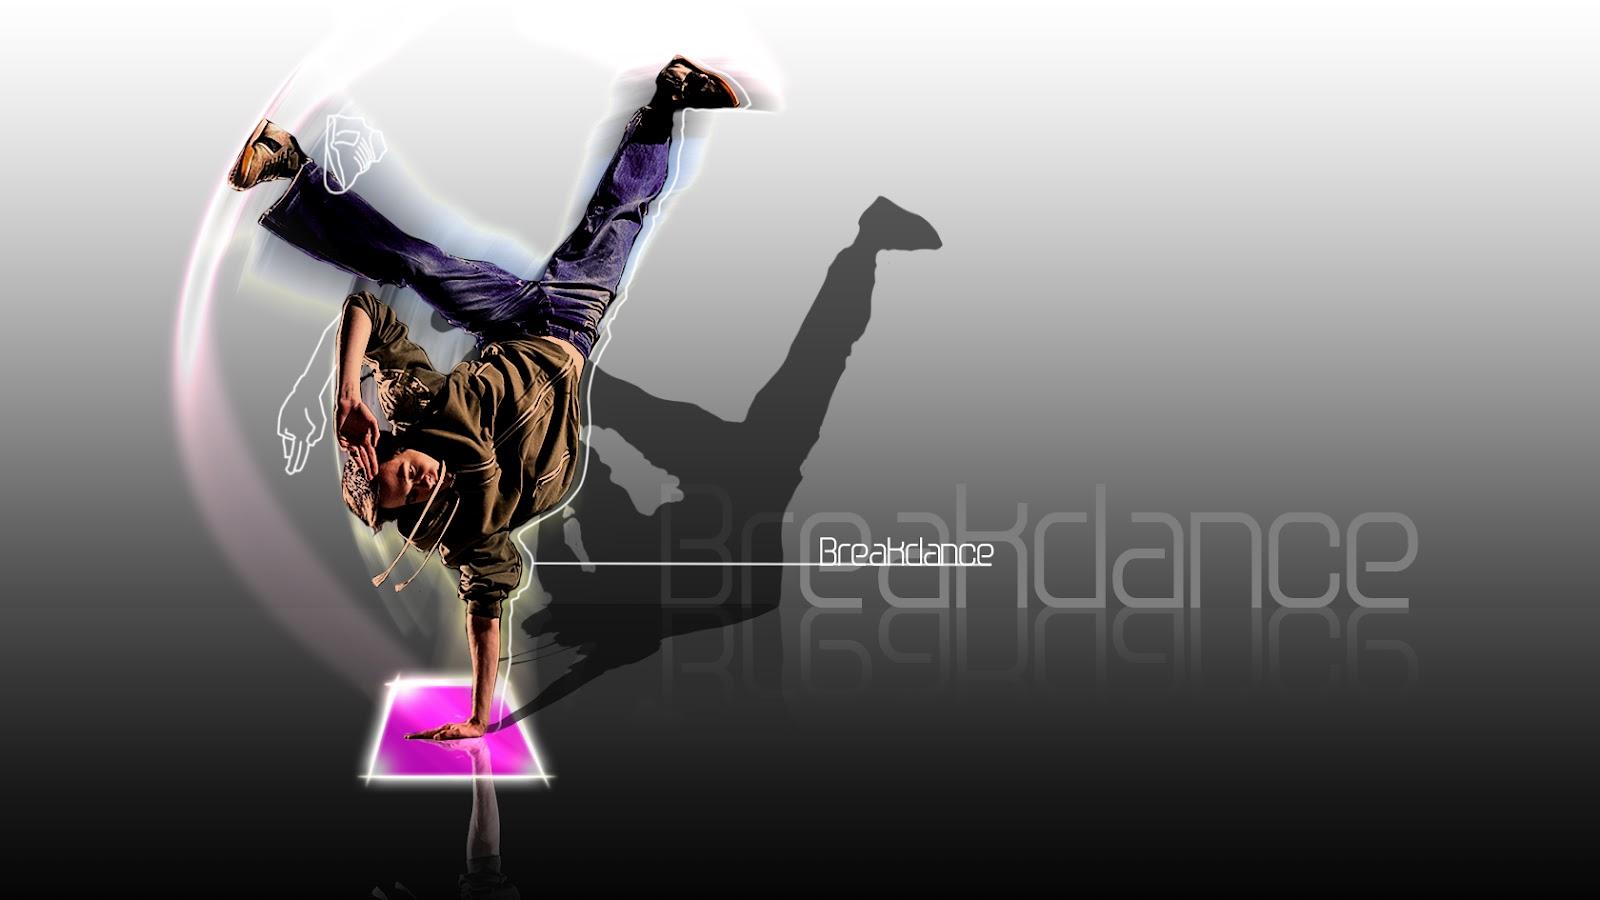 http://4.bp.blogspot.com/-nQpU2z7RWSU/T1Ch3LjN_VI/AAAAAAAACG0/nJNVe7bAfGI/s1600/Breakdance_wallpaper_by+hip+hopdancing+-+streetdance.jpg